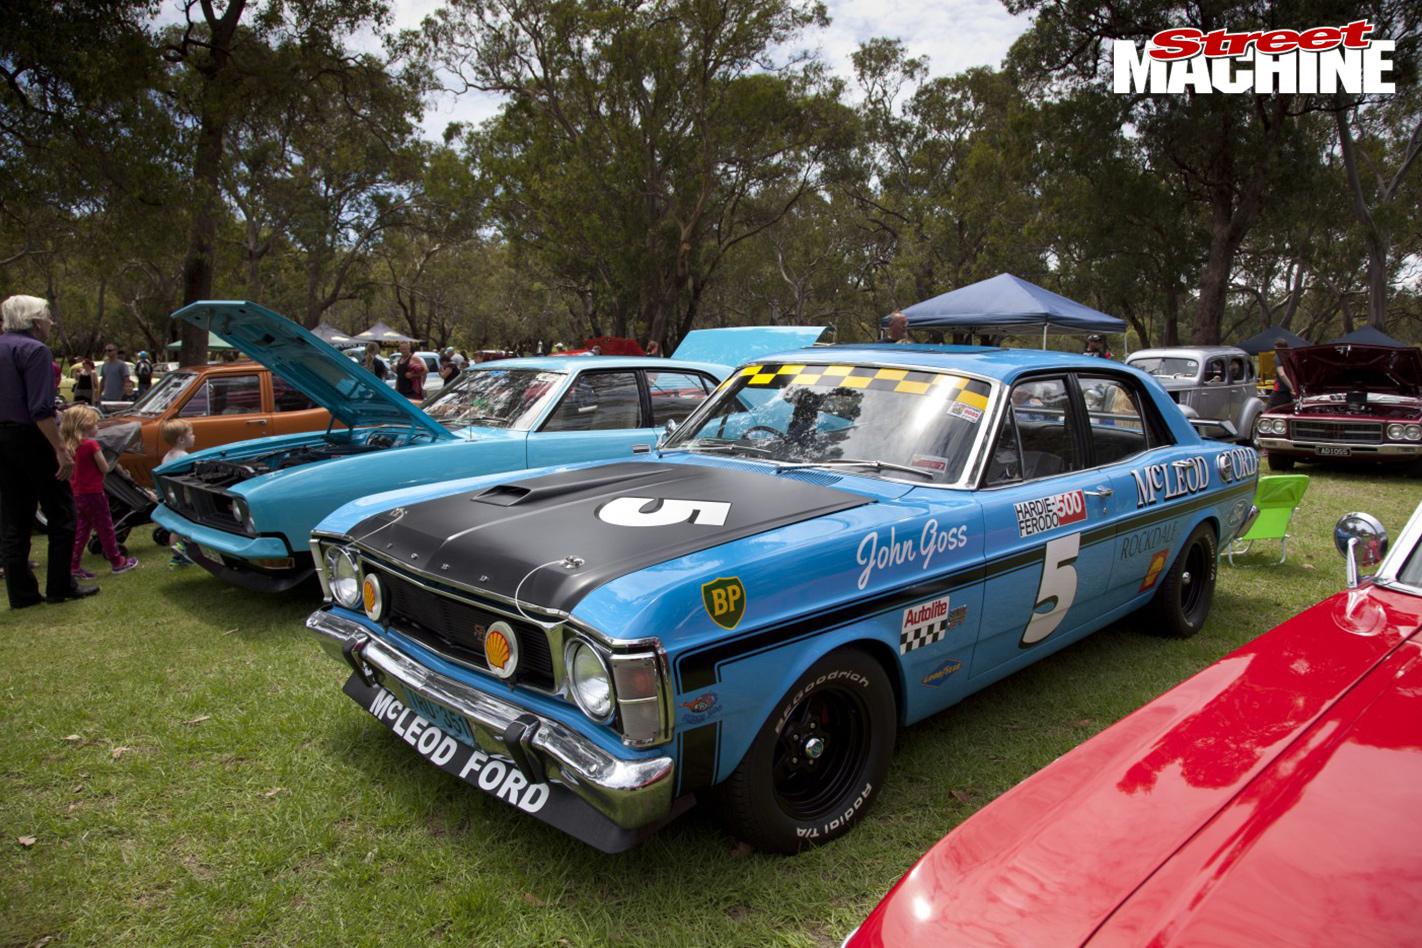 THE-FINAL-BIG-ALS-POKER-RUN blue car